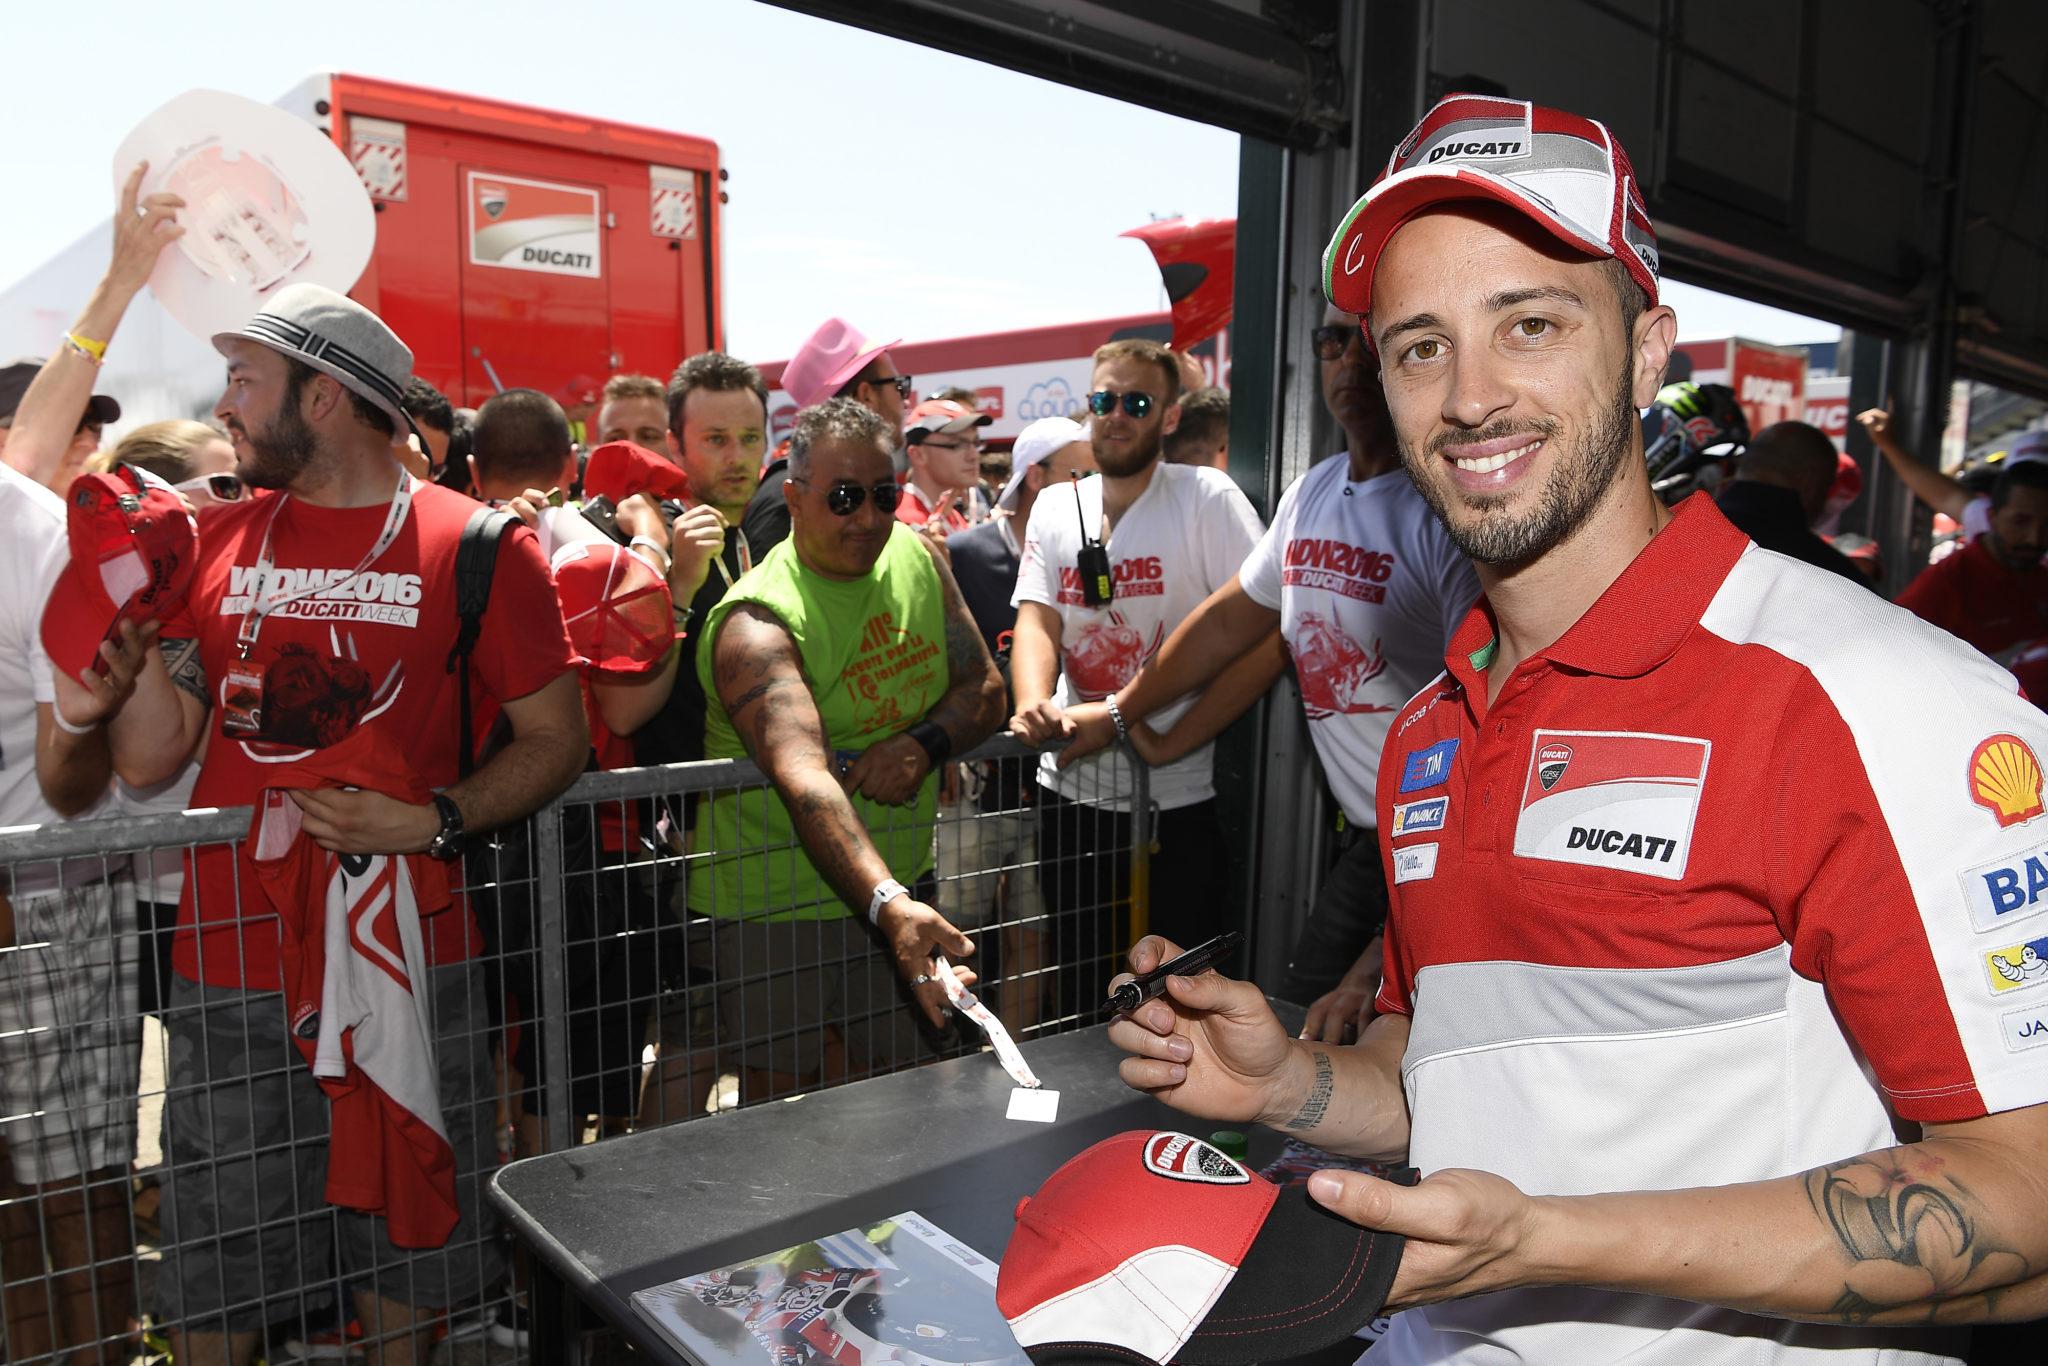 Ducati confirms riders present at the World Ducati Week